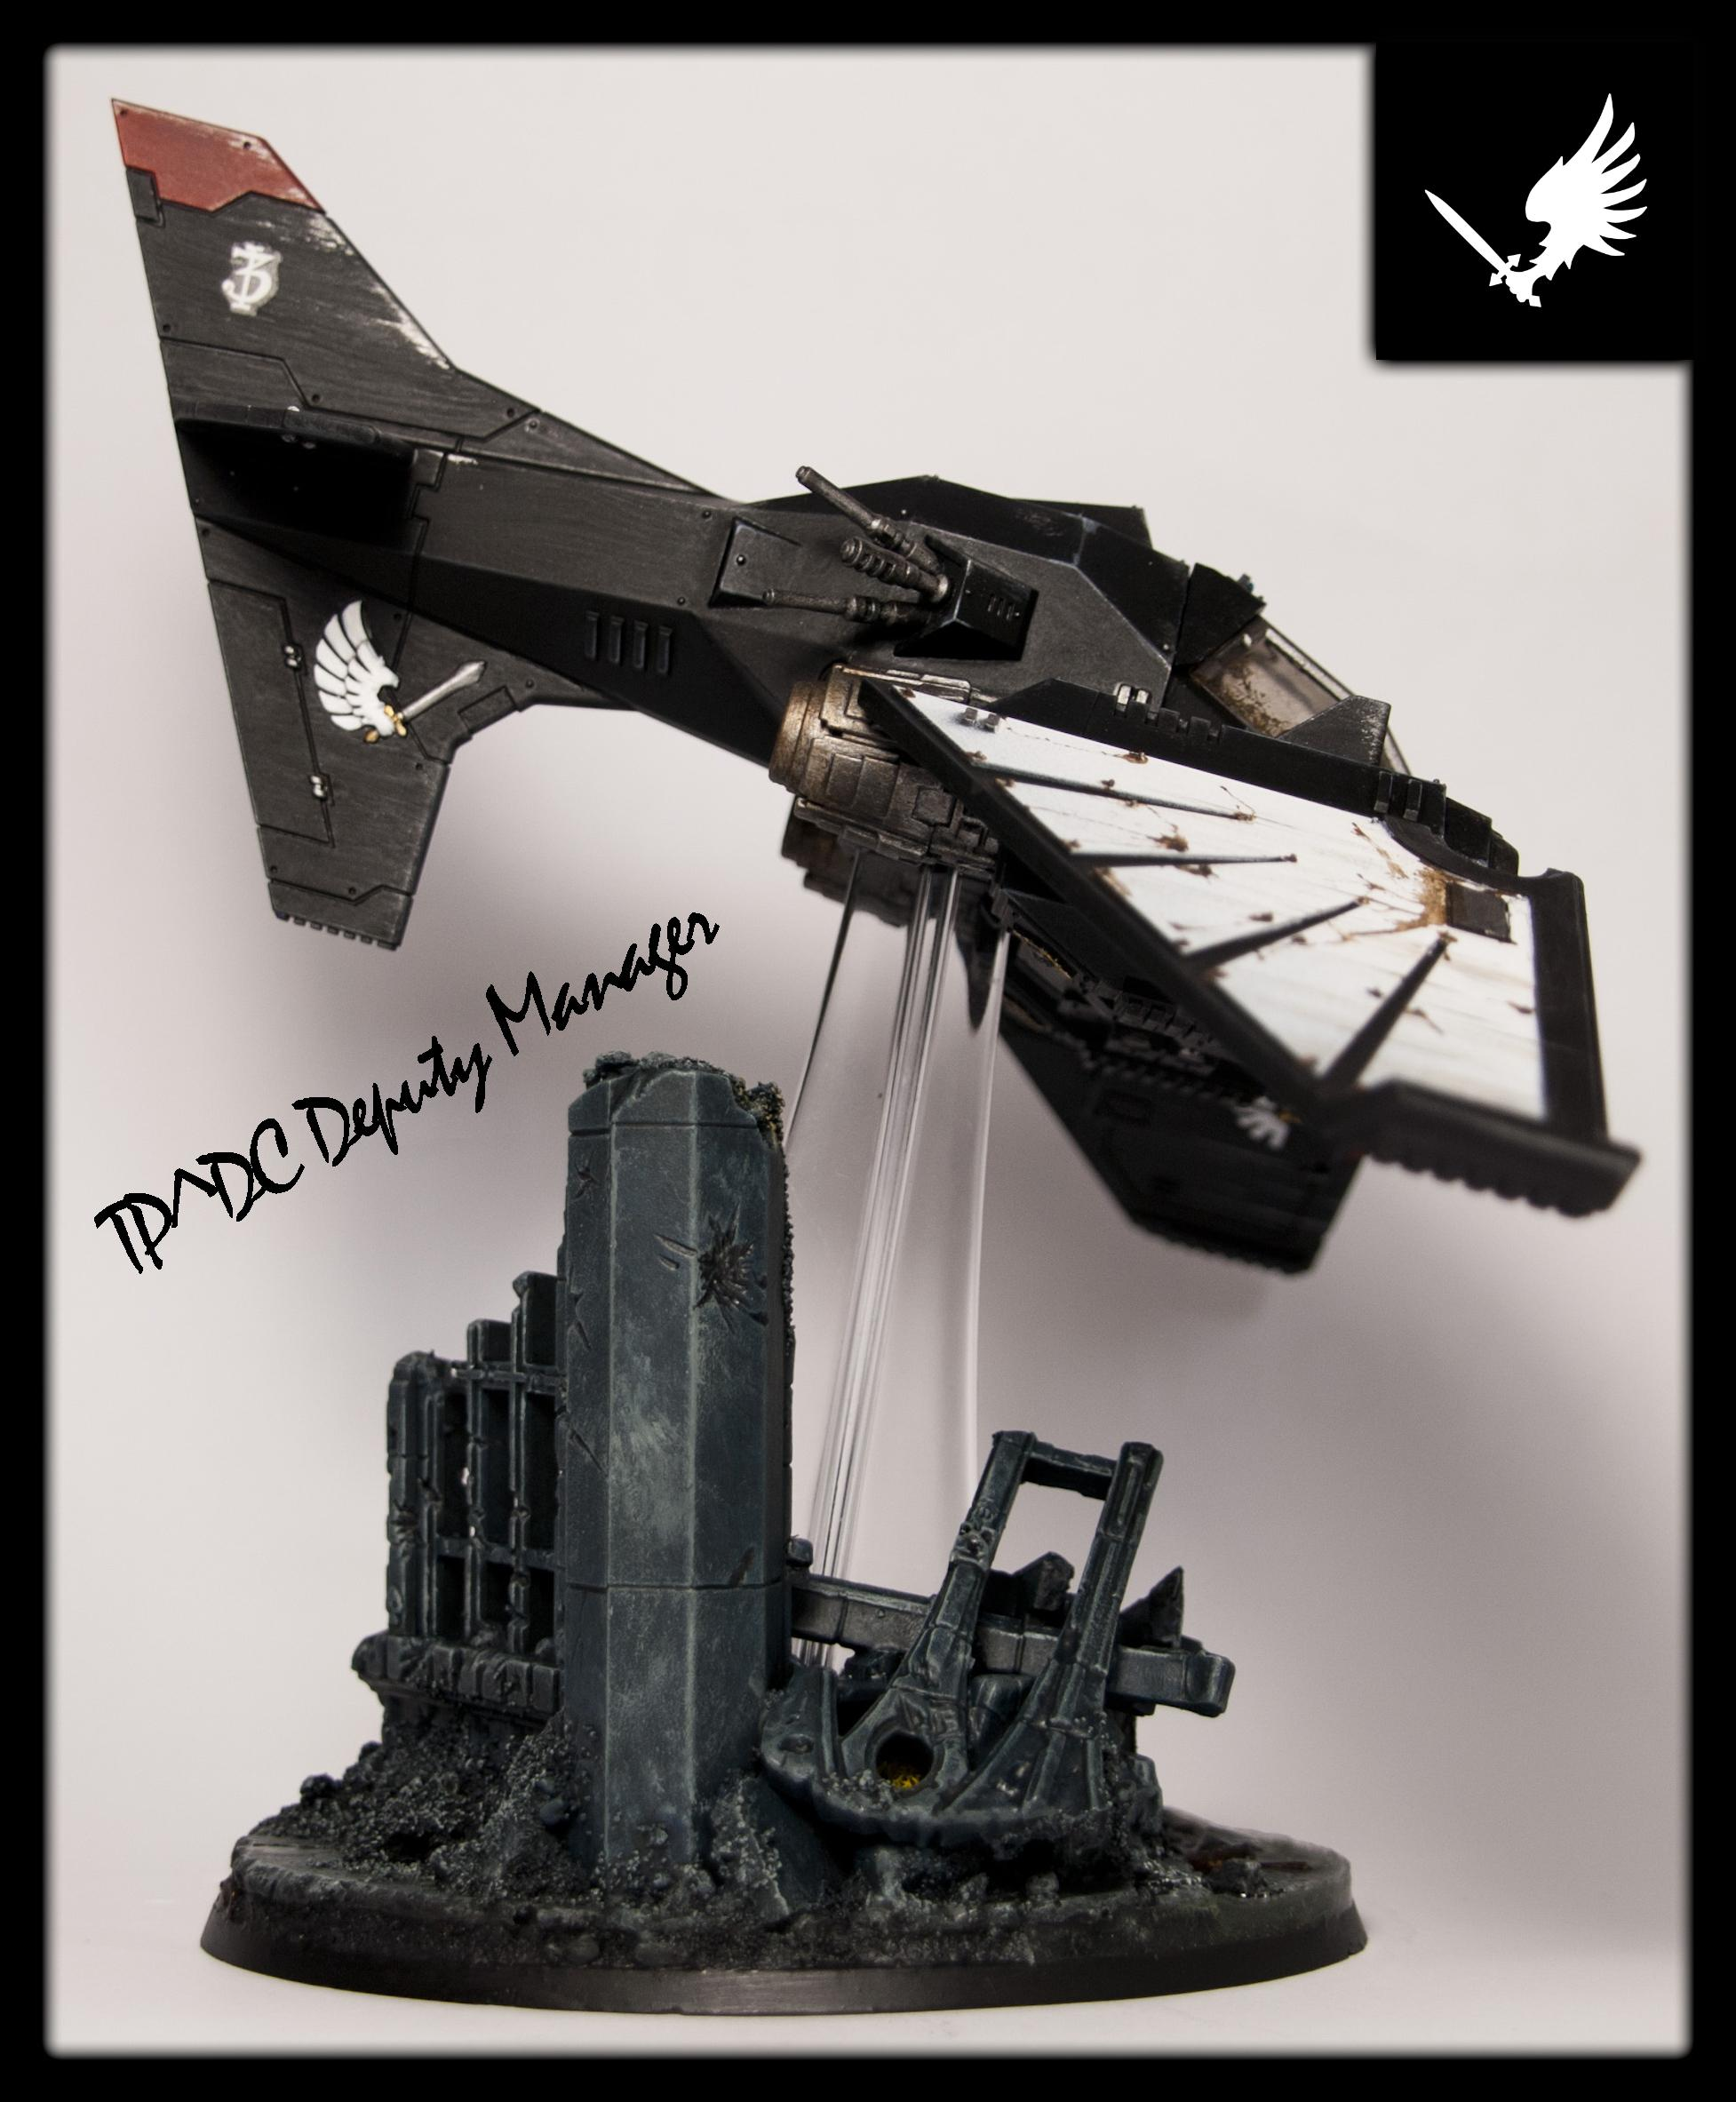 Jetfighter, Nephilim, Ravenwing